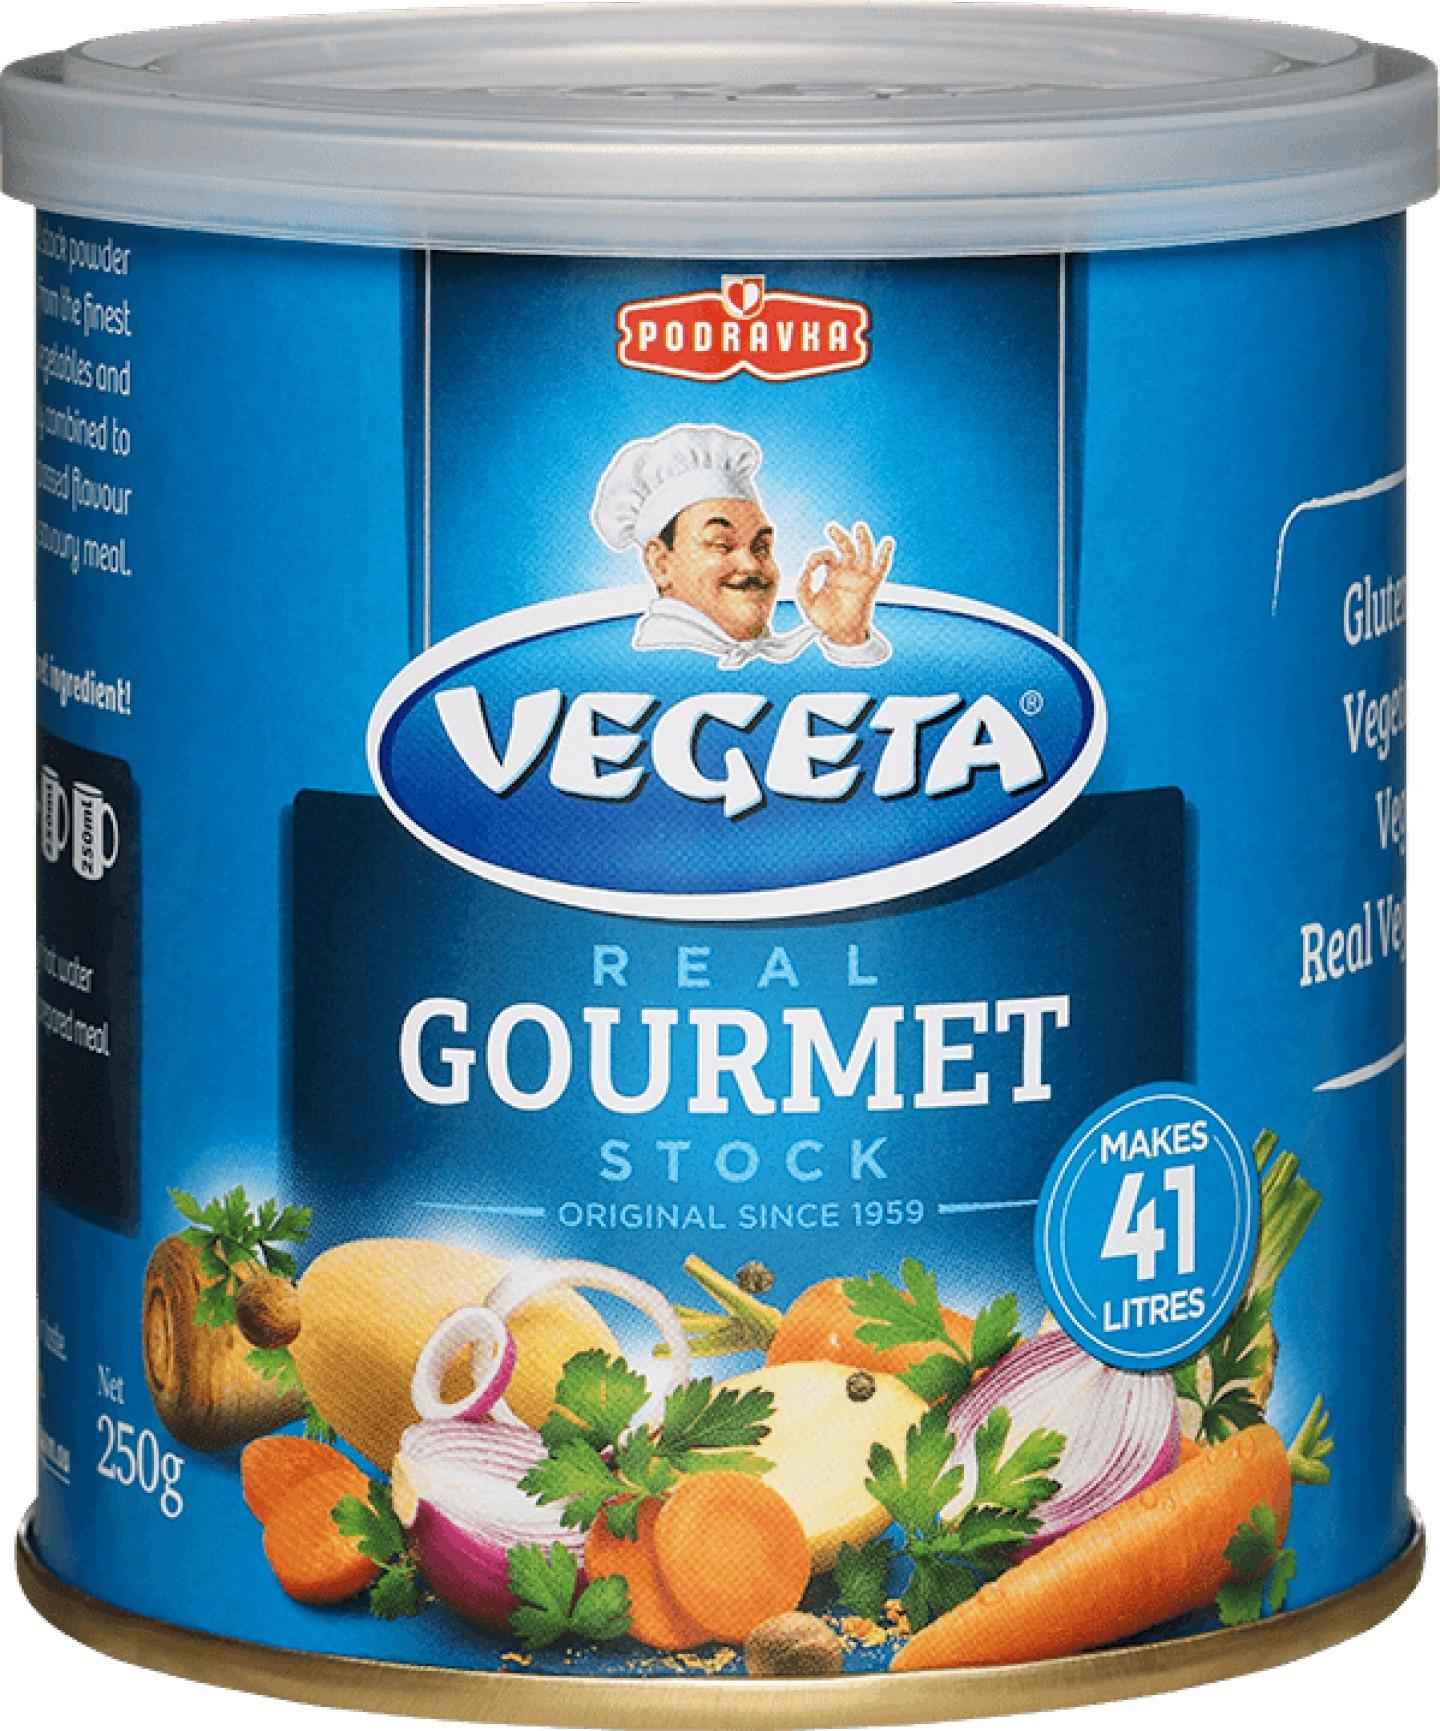 Australian Products Food